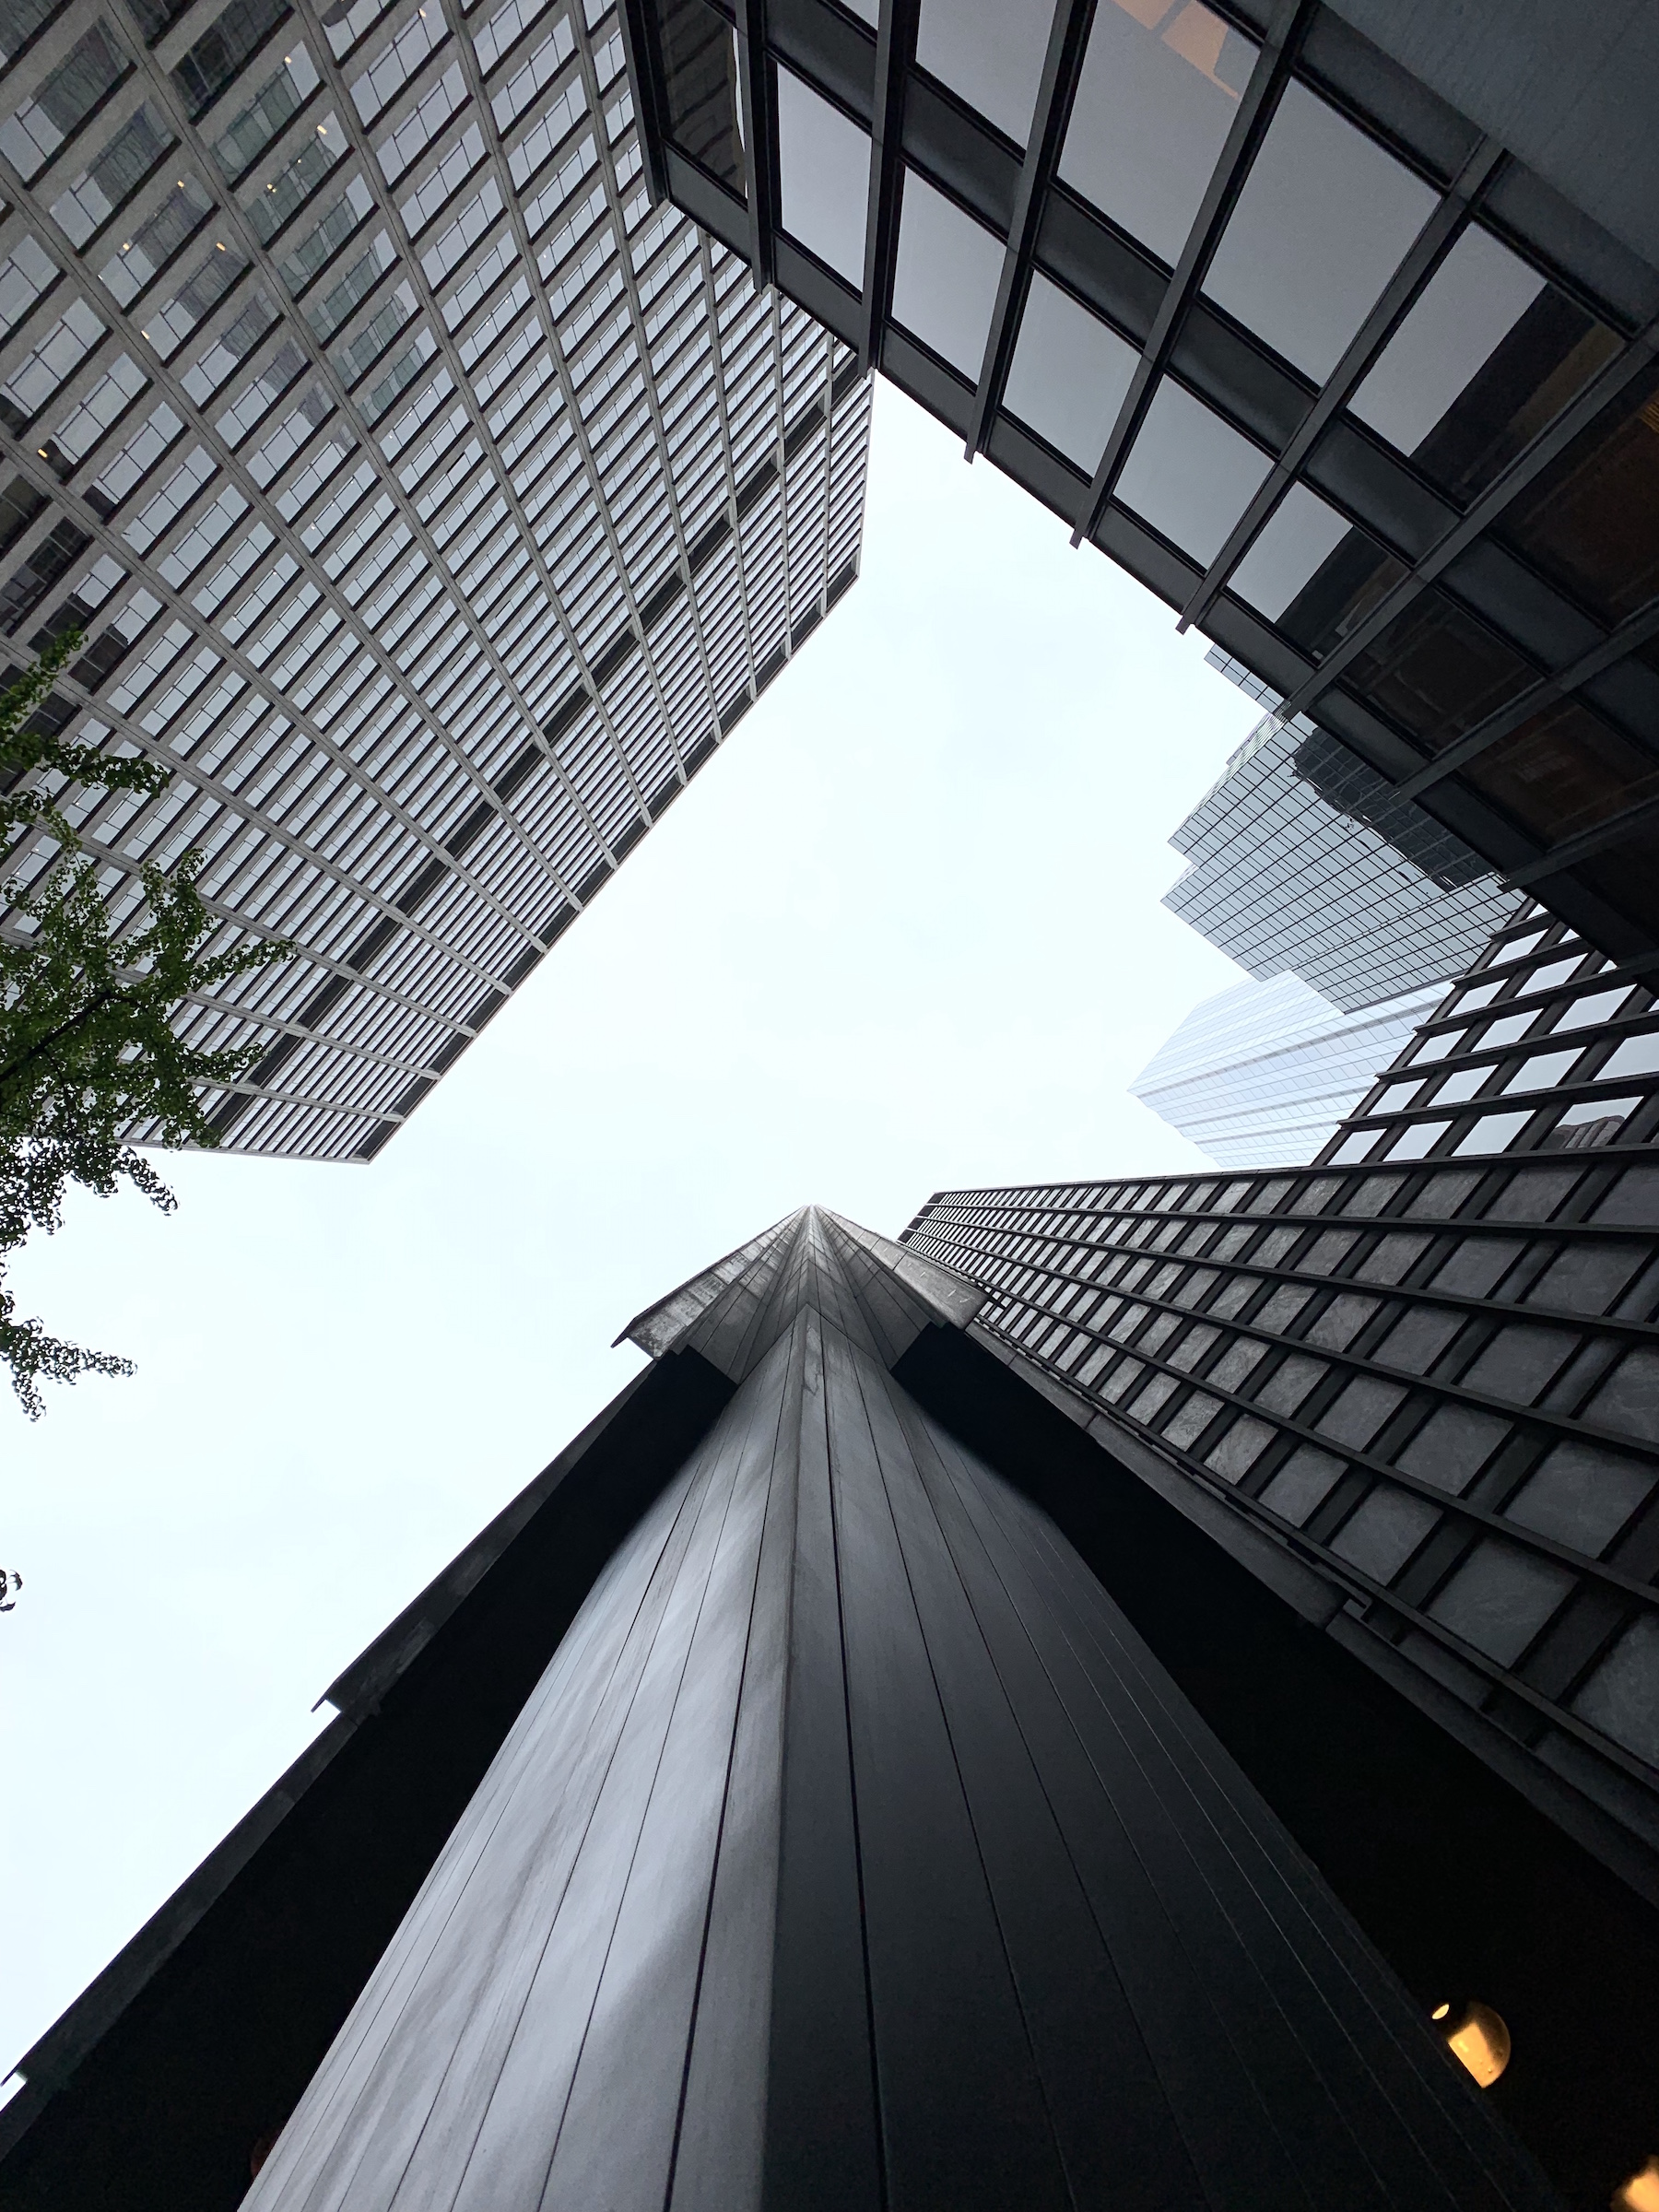 Architect-interior-penthouse-New-york-modern-architecture-Bob-Romijnders-Nijmegen-apartment